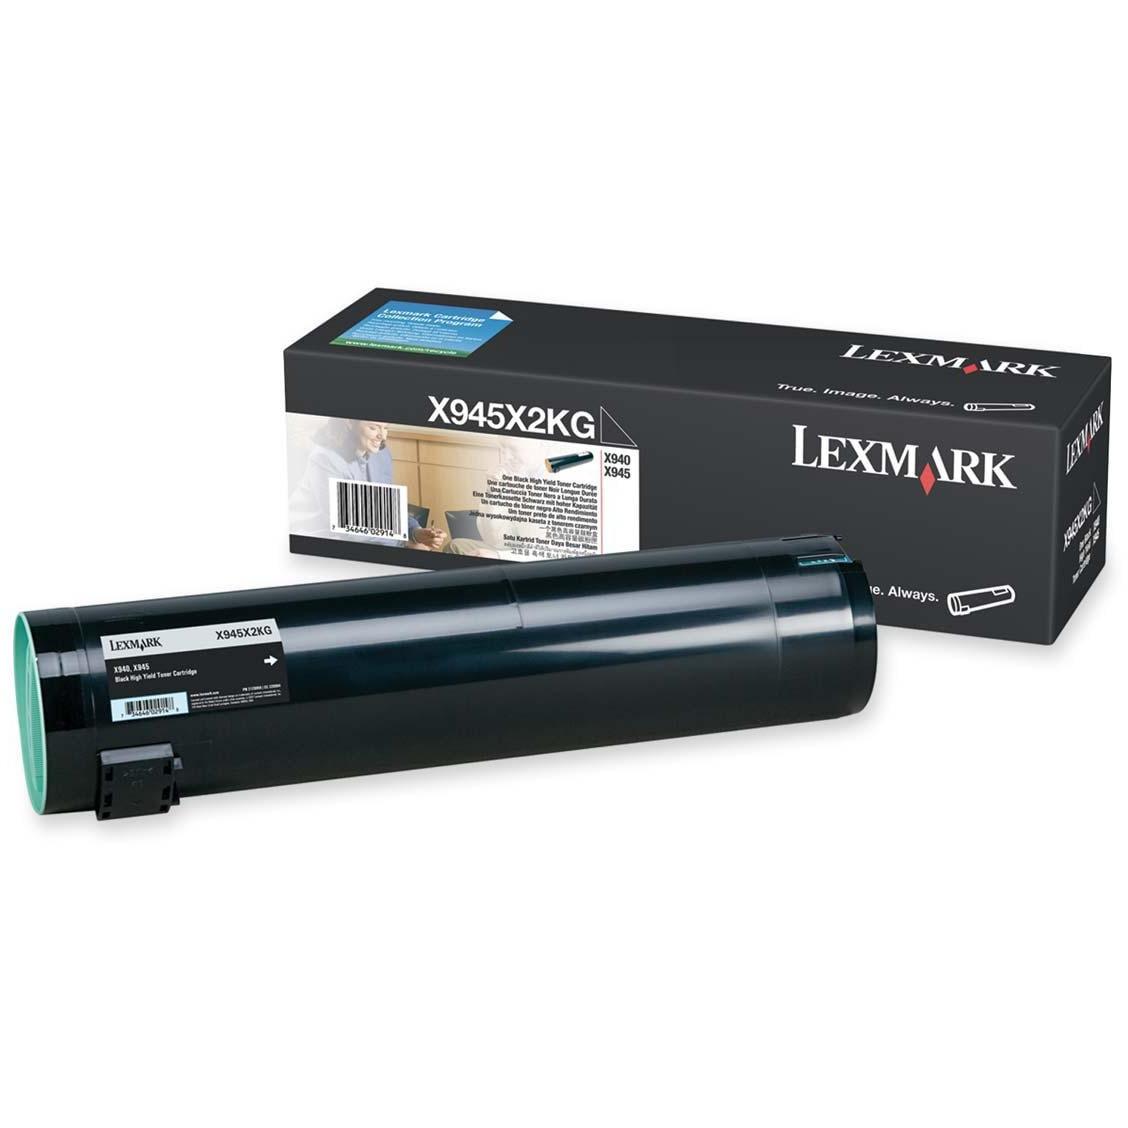 Lexmark, LEXX945X2KG, X945X2CG/KG/MG/YG Toner Cartridges, 1 Each